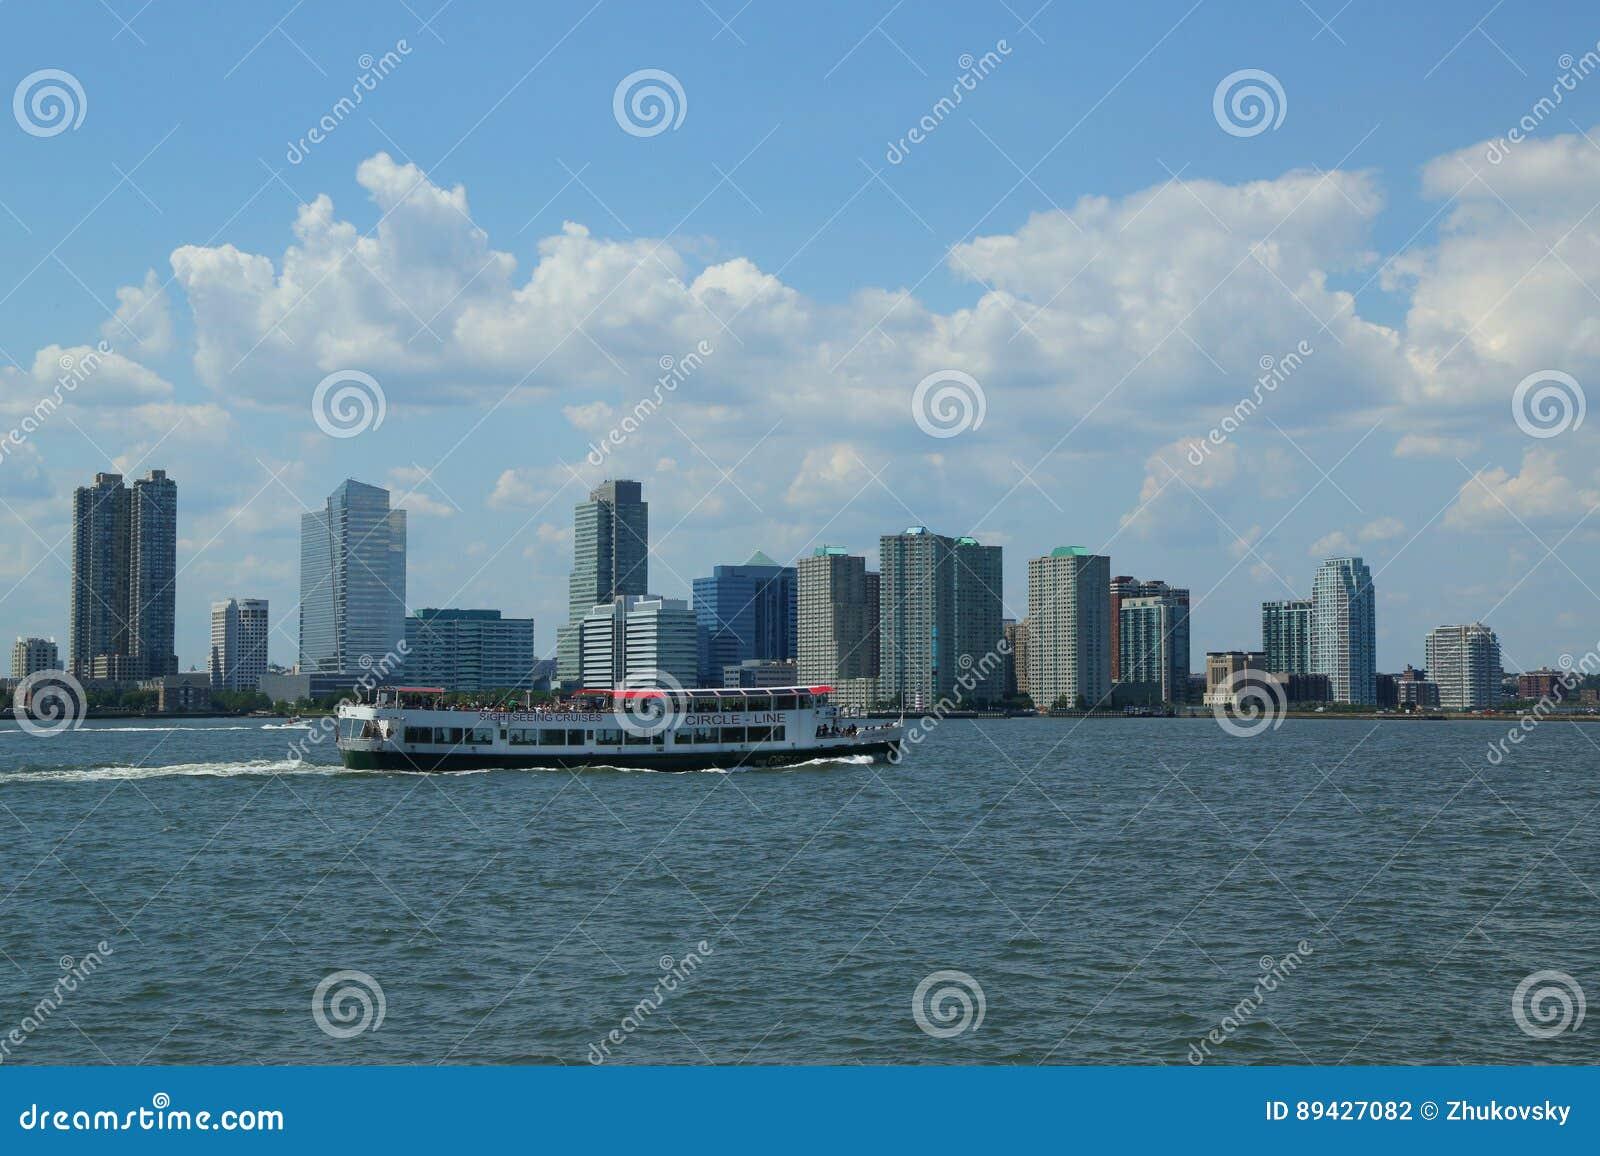 jersey city sightseeing cruises